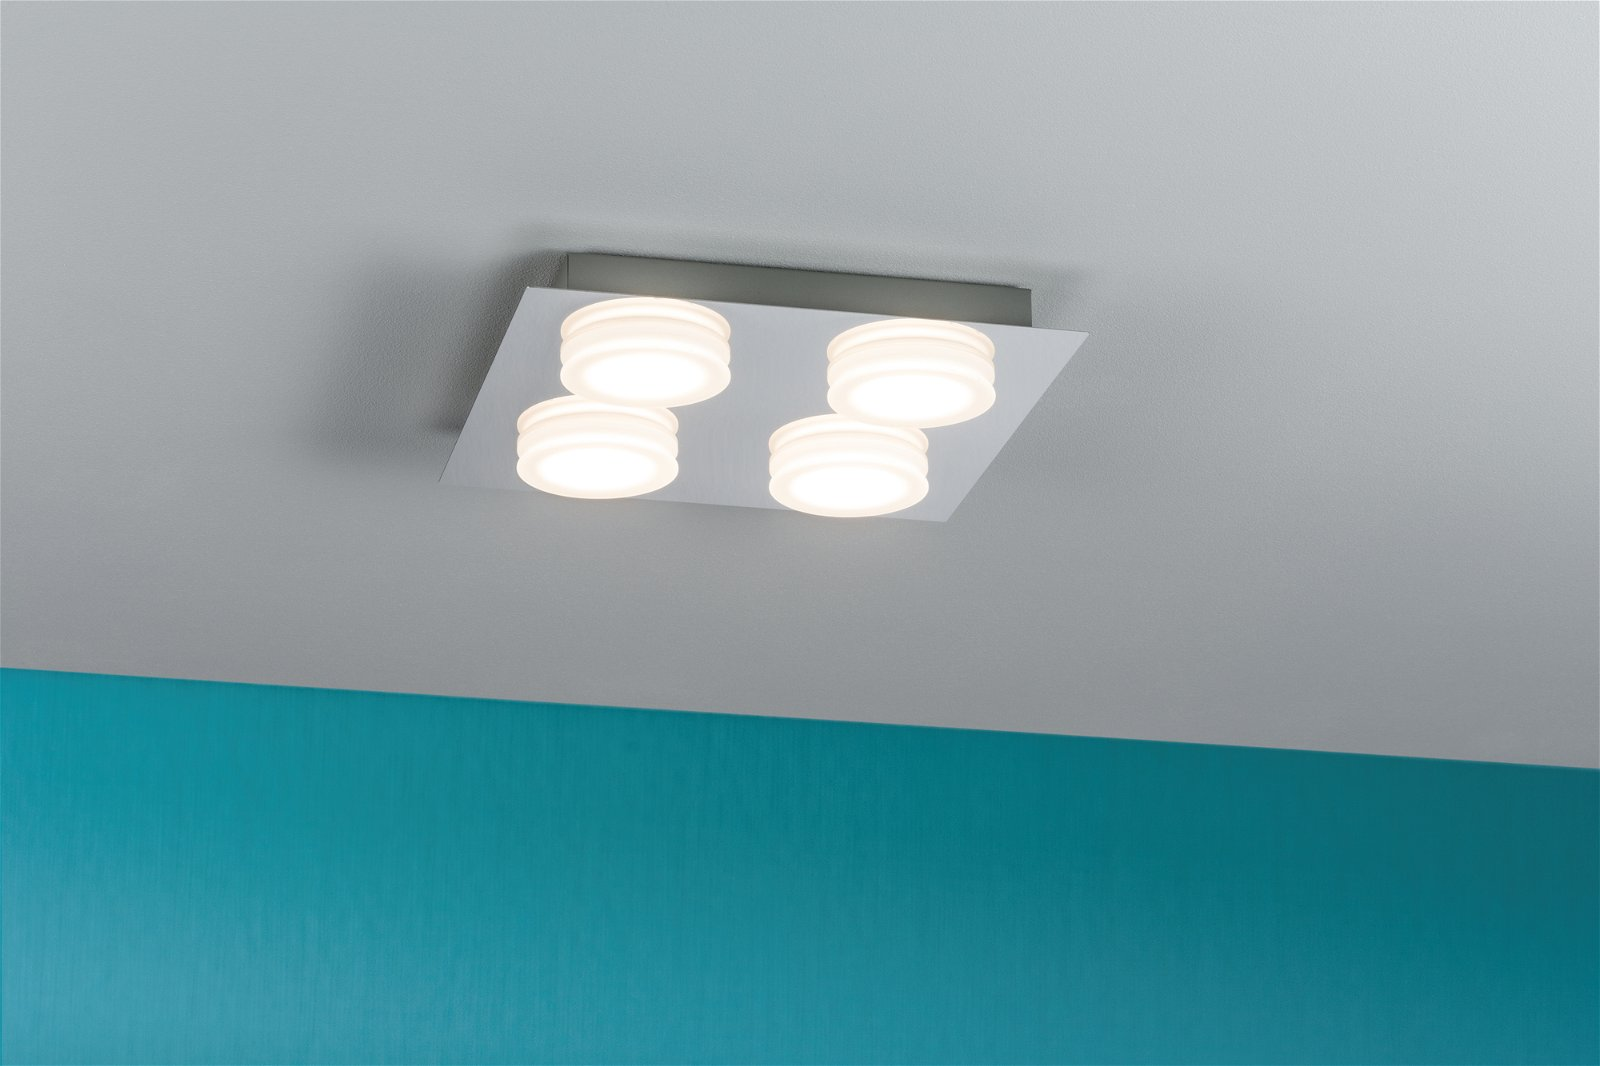 LED Deckenleuchte Doradus 3000K 4x420lm 230V 4x4,7W Chrom